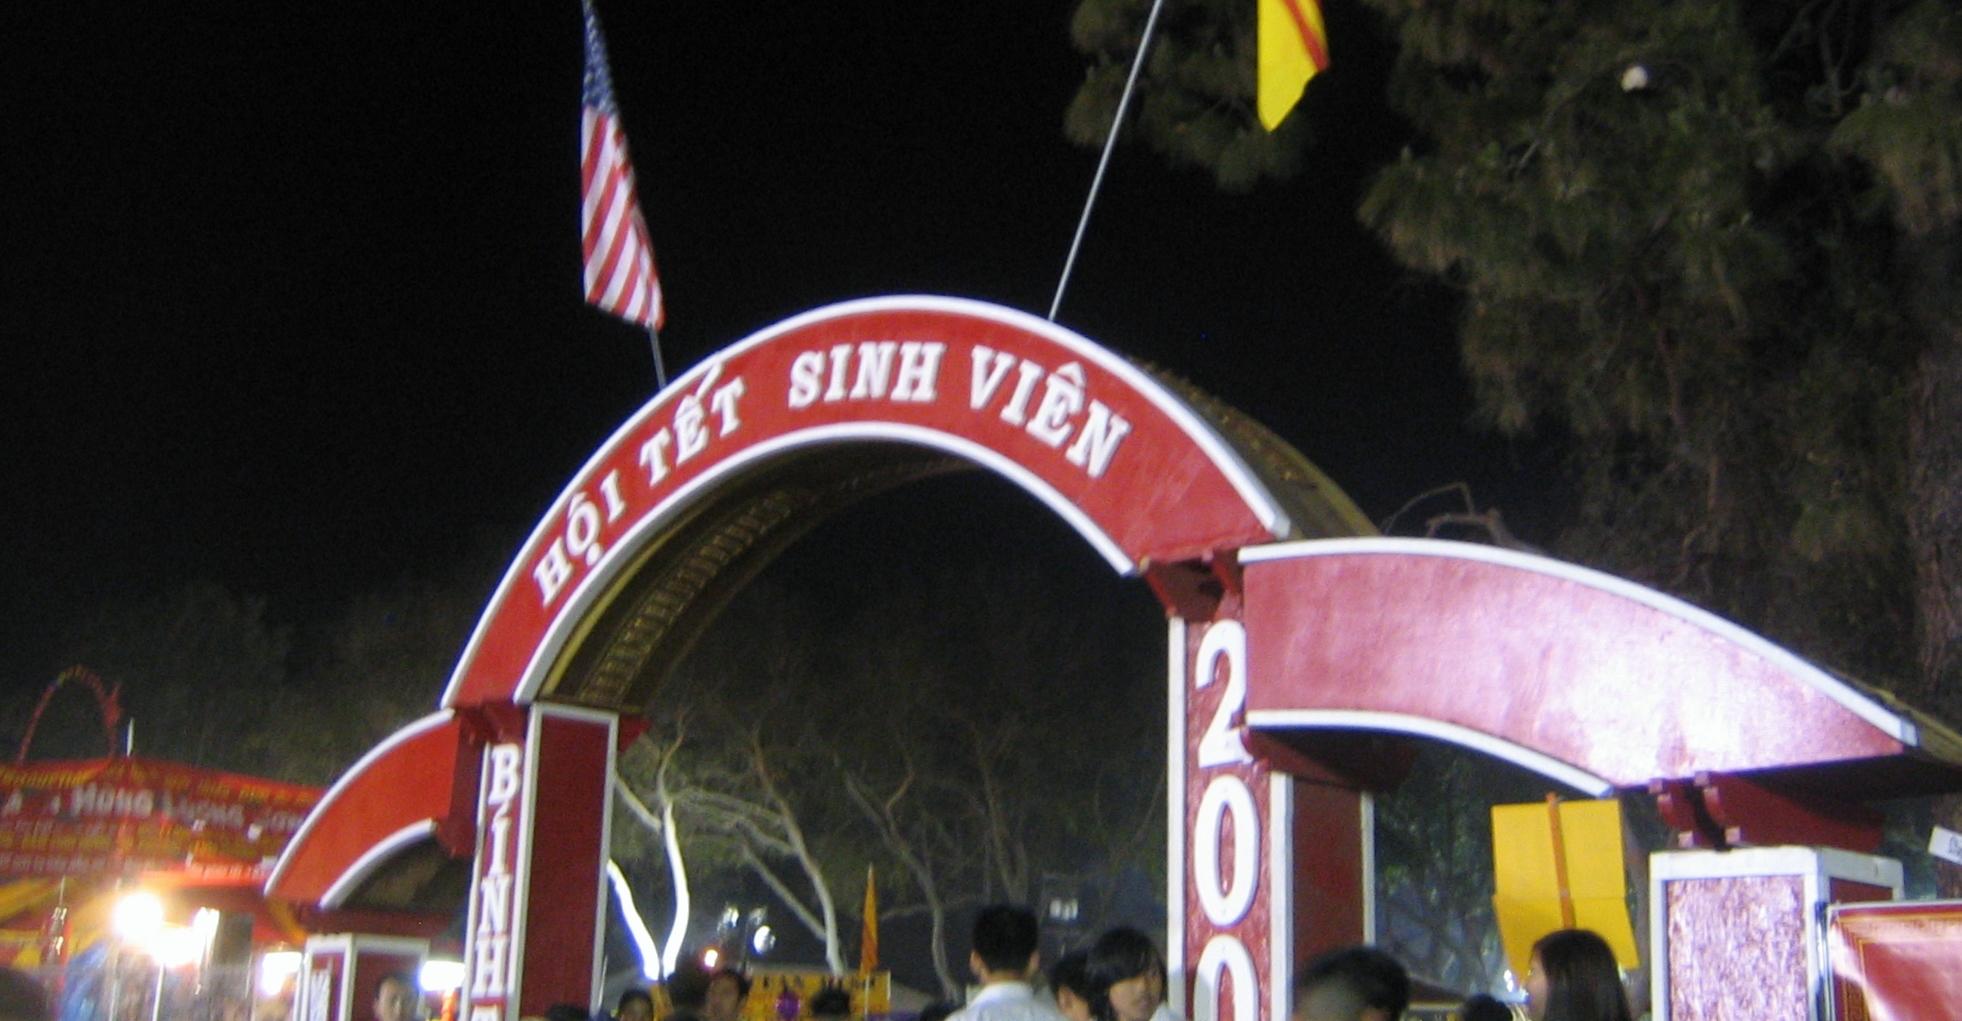 Tet_Festival_Little_Saigon